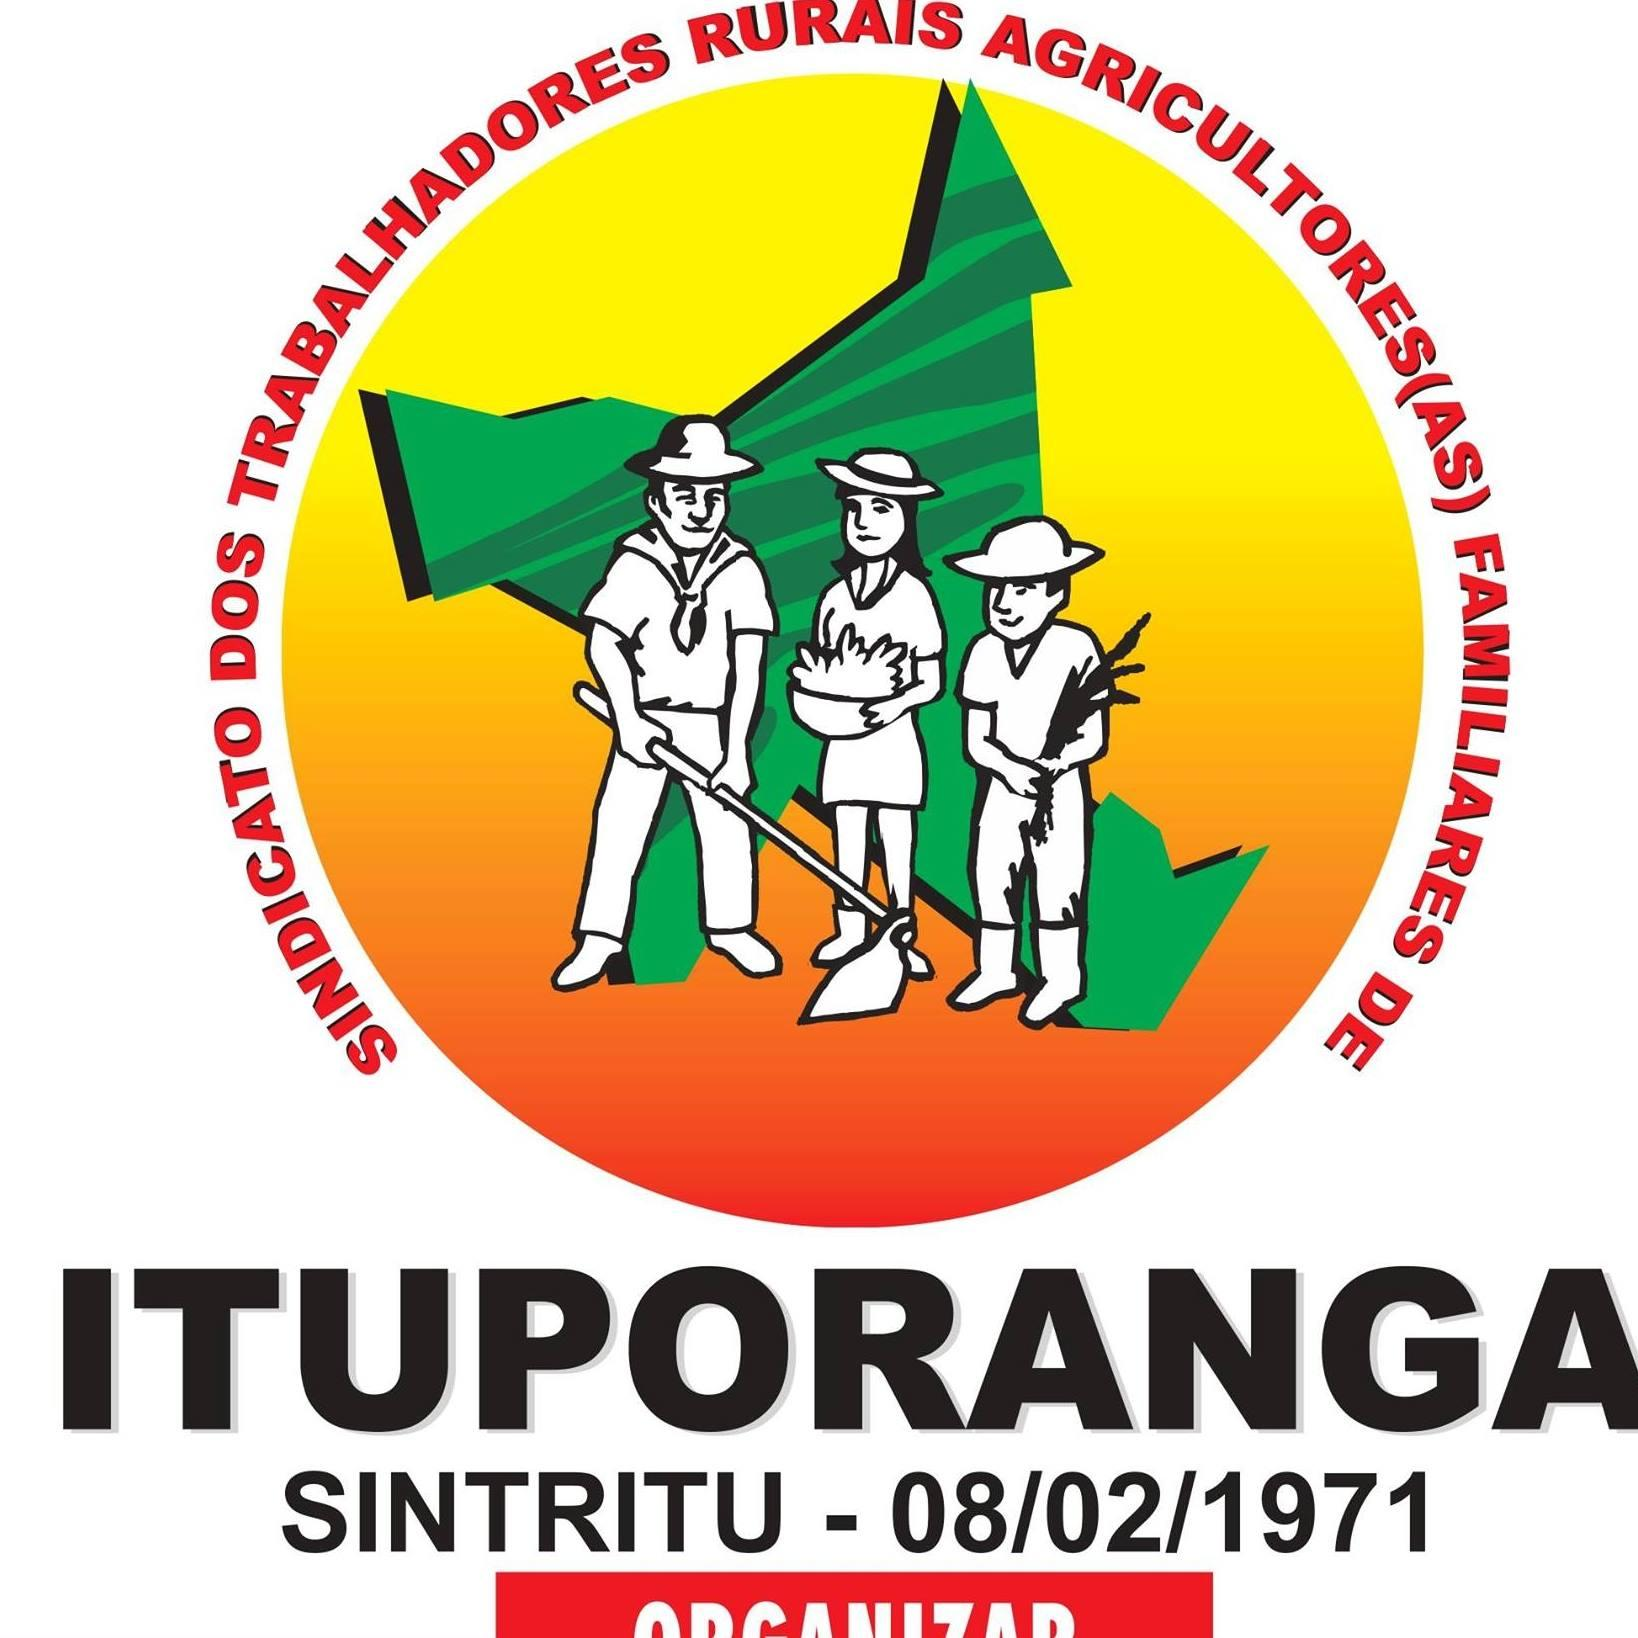 Sindicato dos trabalhadores rurais de Ituporanga completa 50 anos